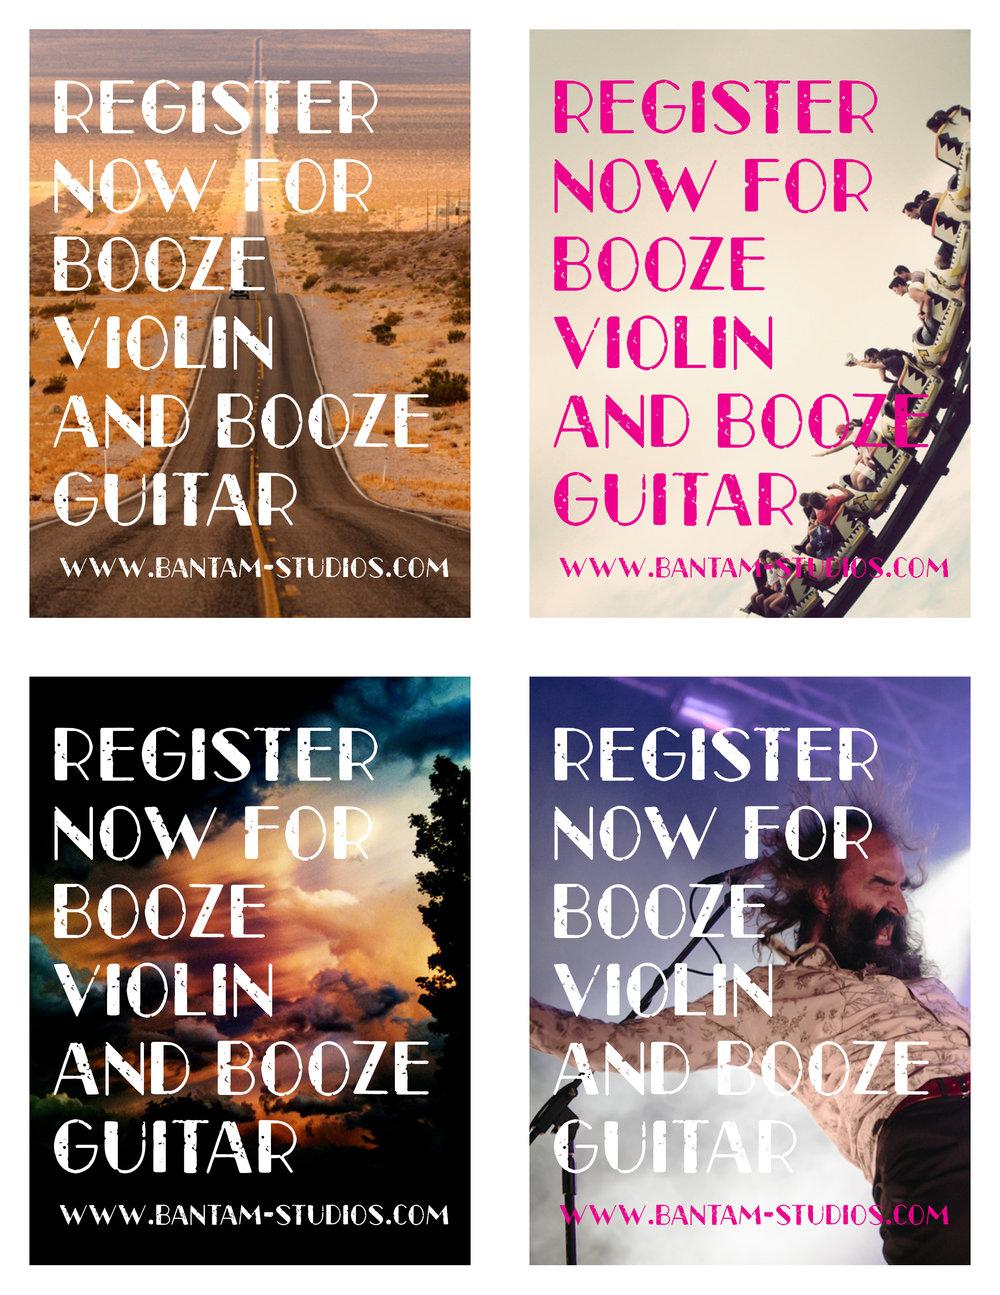 Booze Violin Fall 2014 Postcards4.jpg